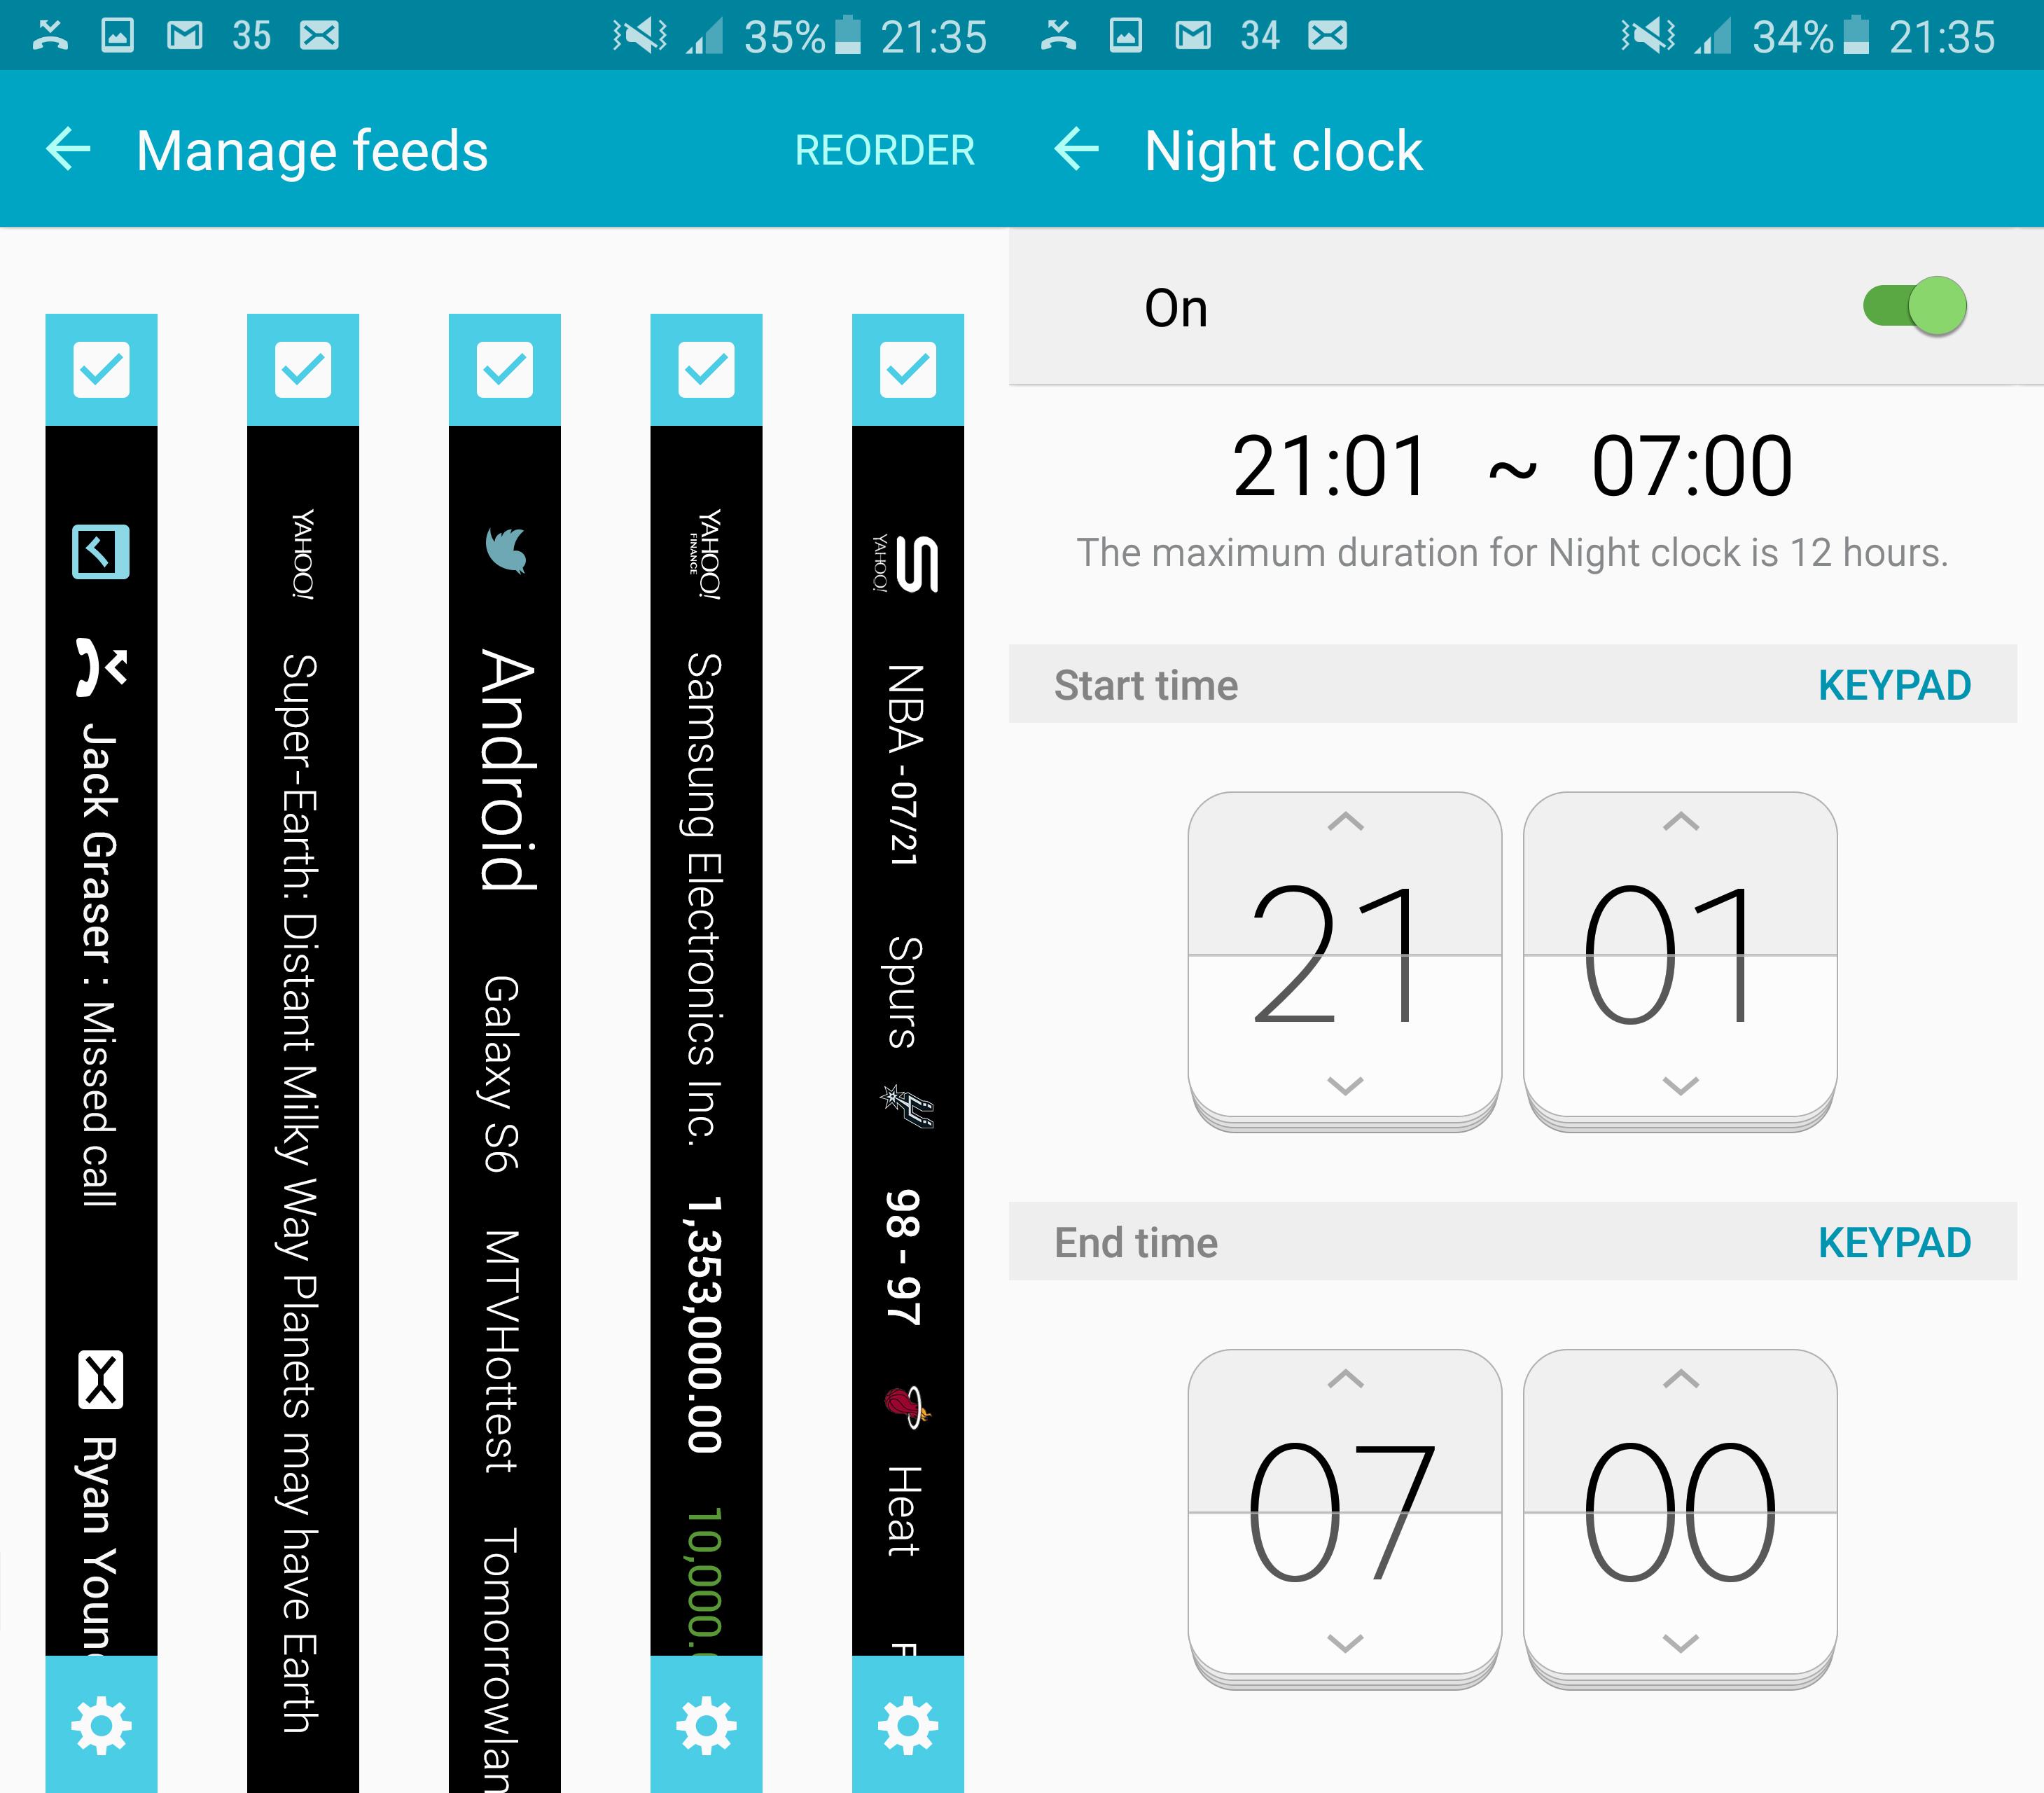 Samsung Galaxy S6 Edge Display Settings Night Clock Screen